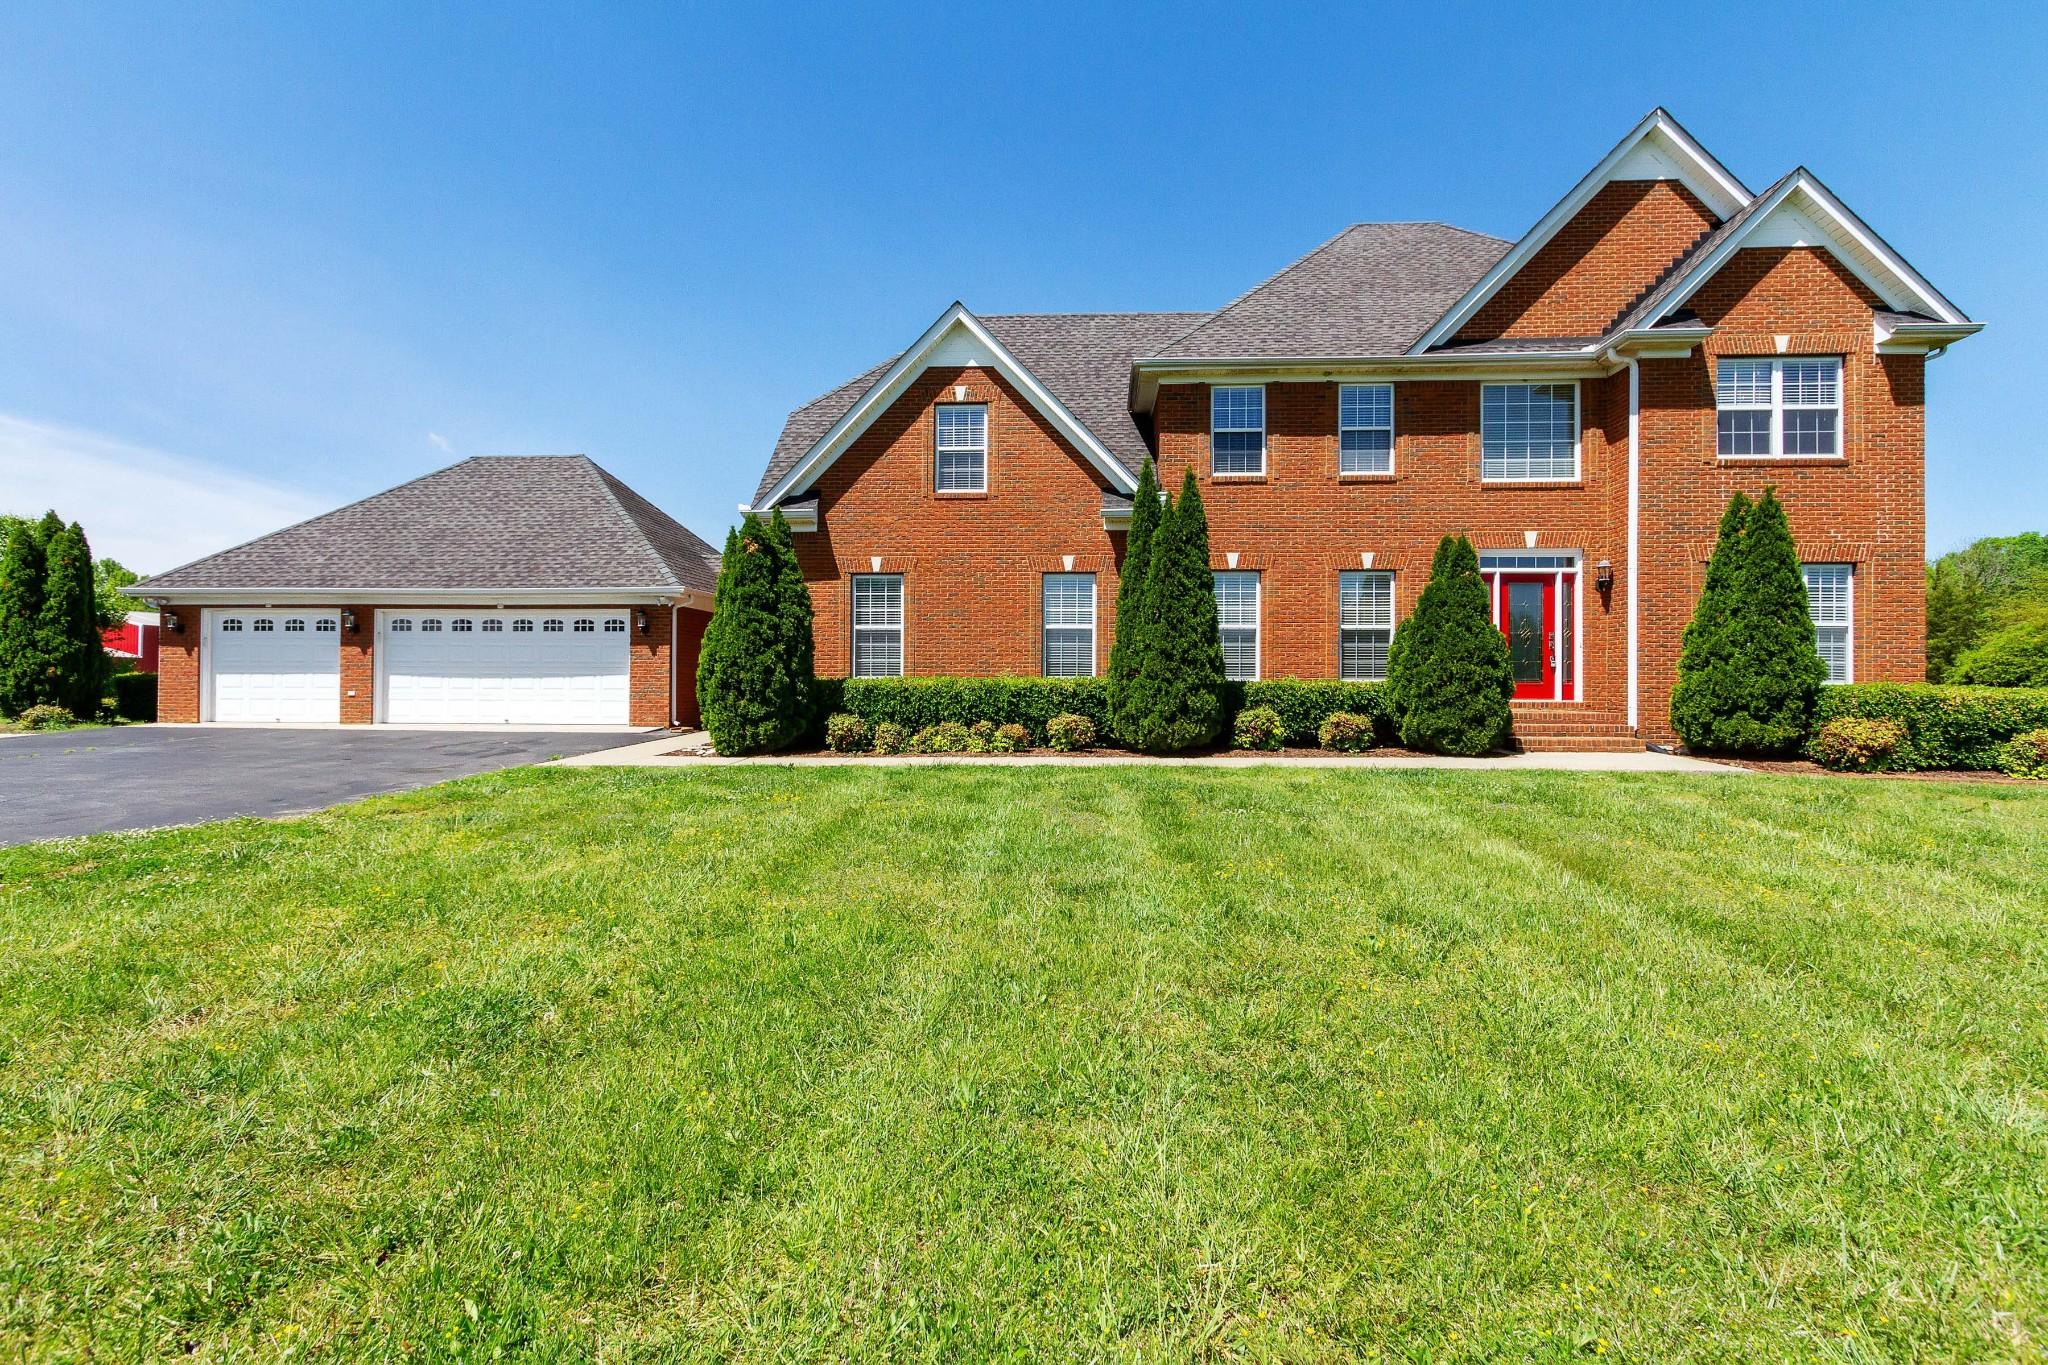 8482 Carlton Rd Property Photo - Christiana, TN real estate listing